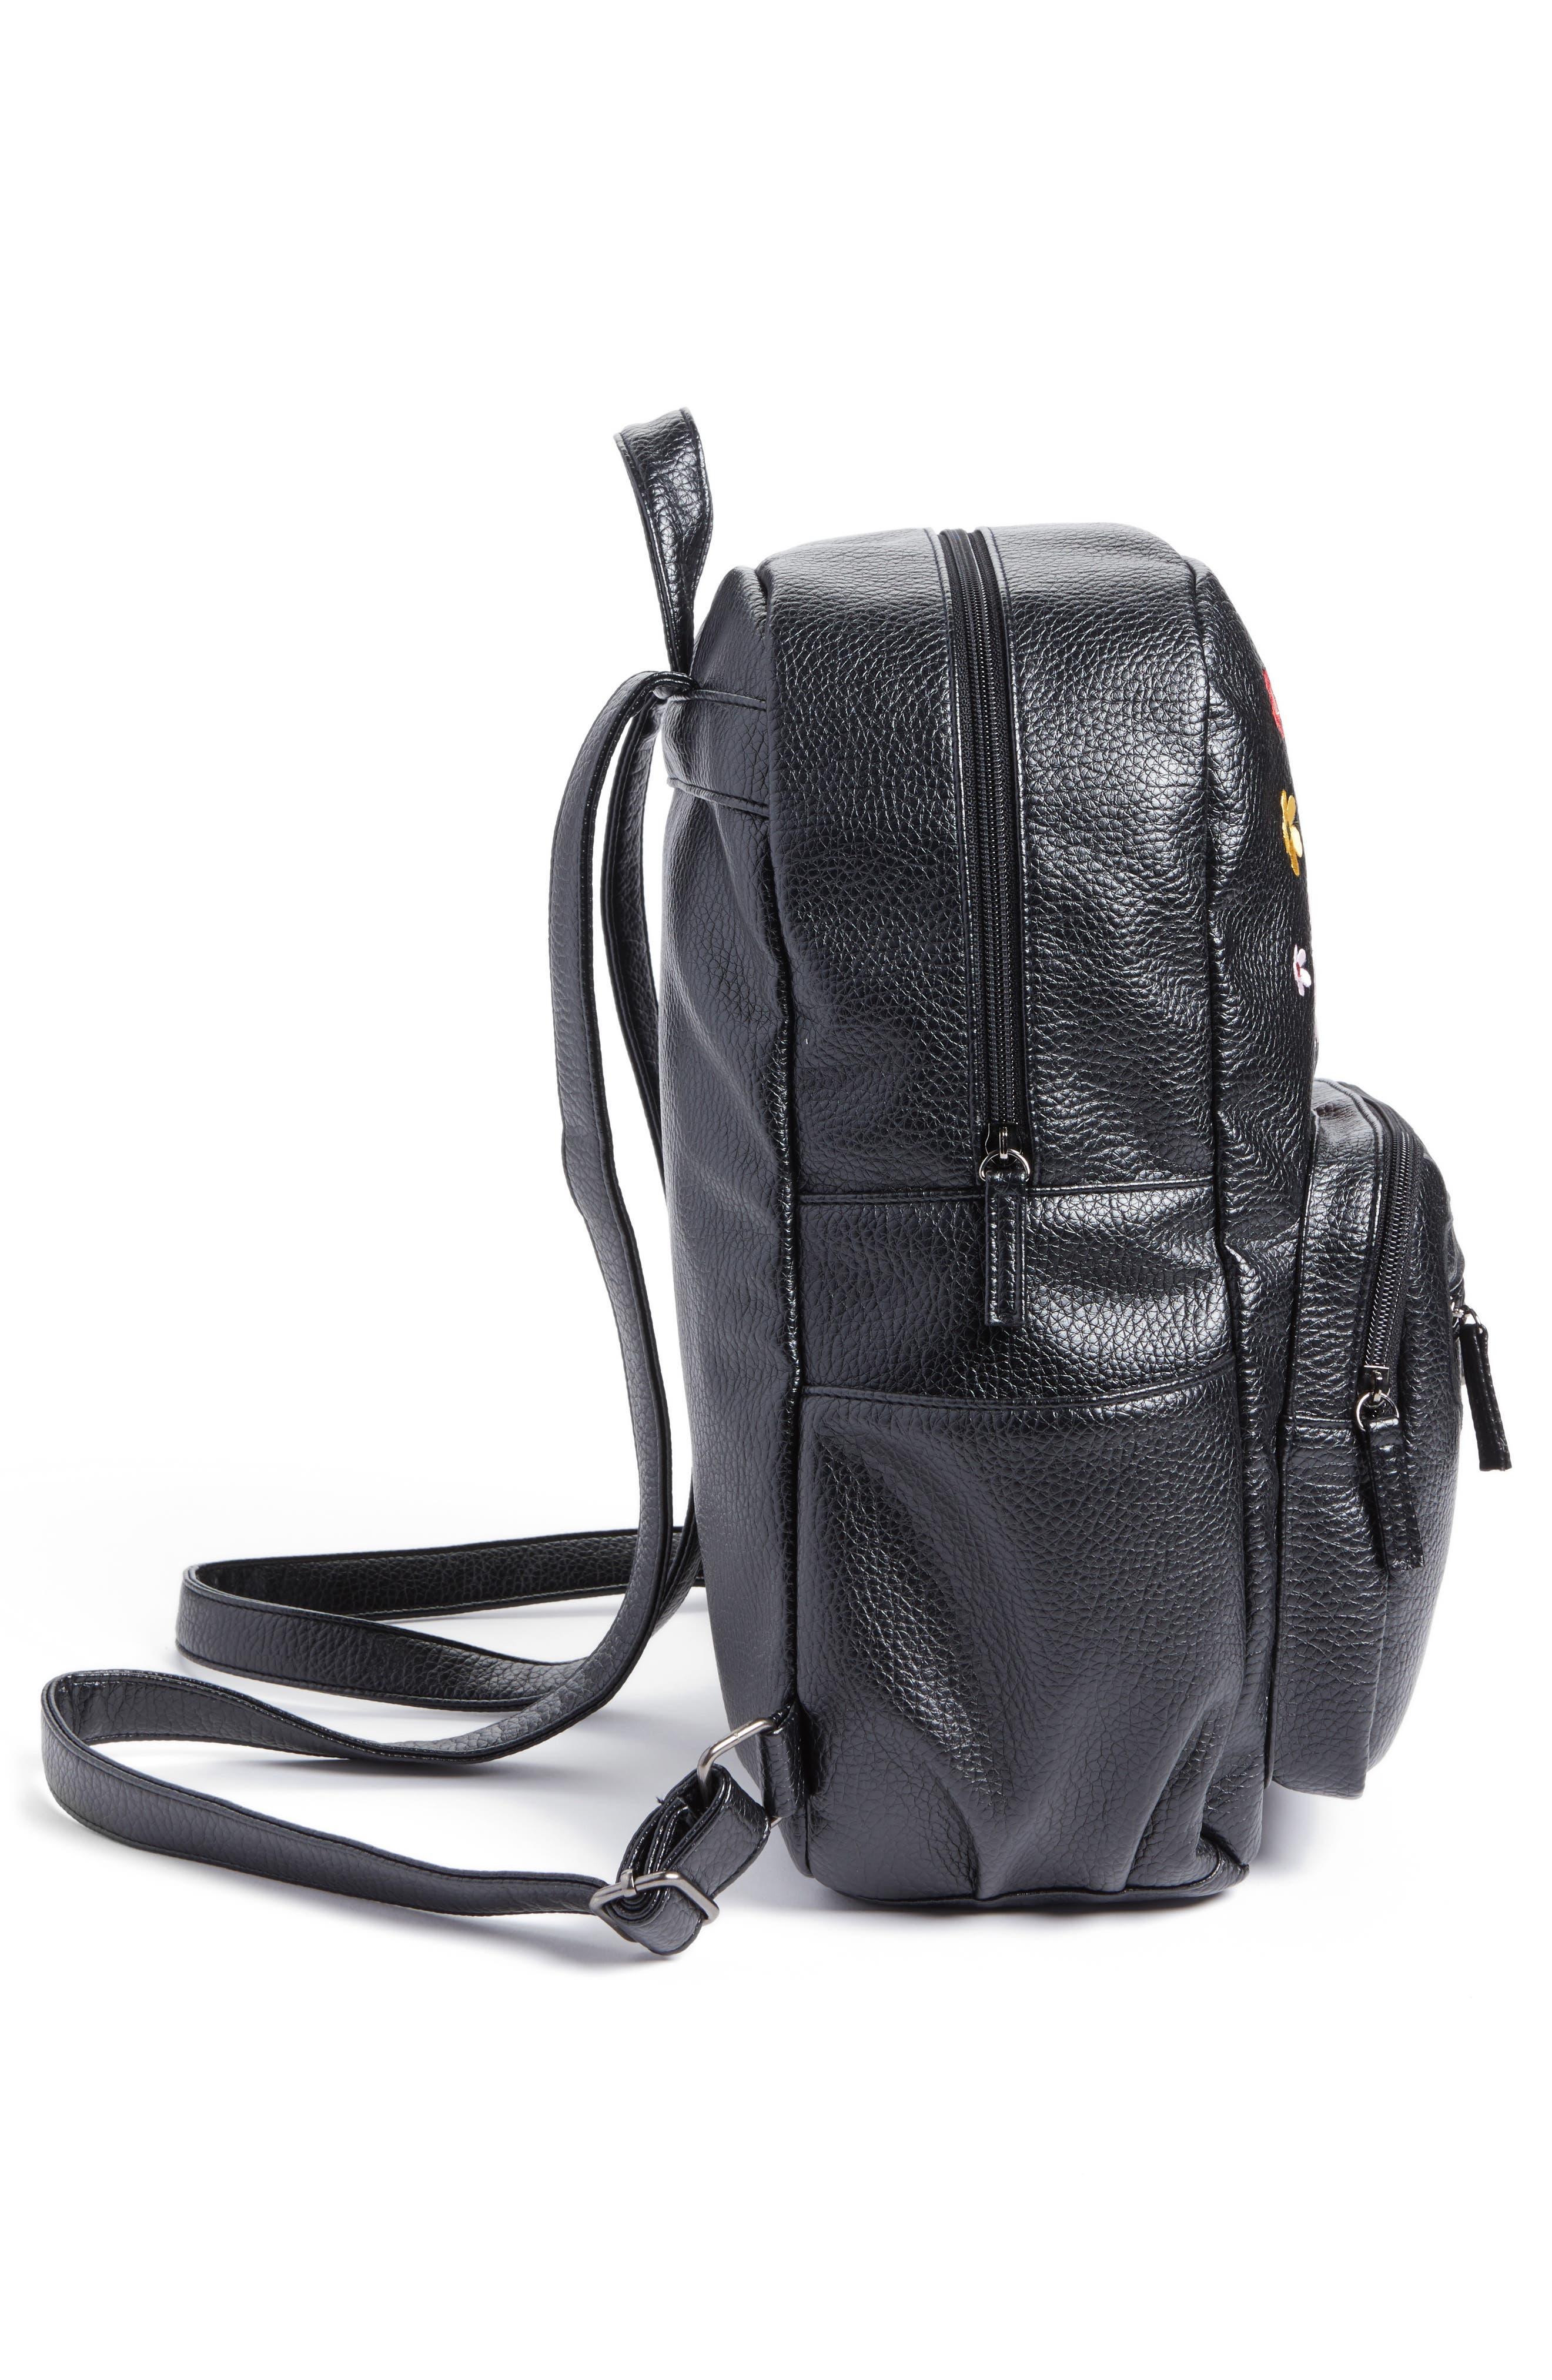 Embroidered Backpack,                             Alternate thumbnail 3, color,                             Black